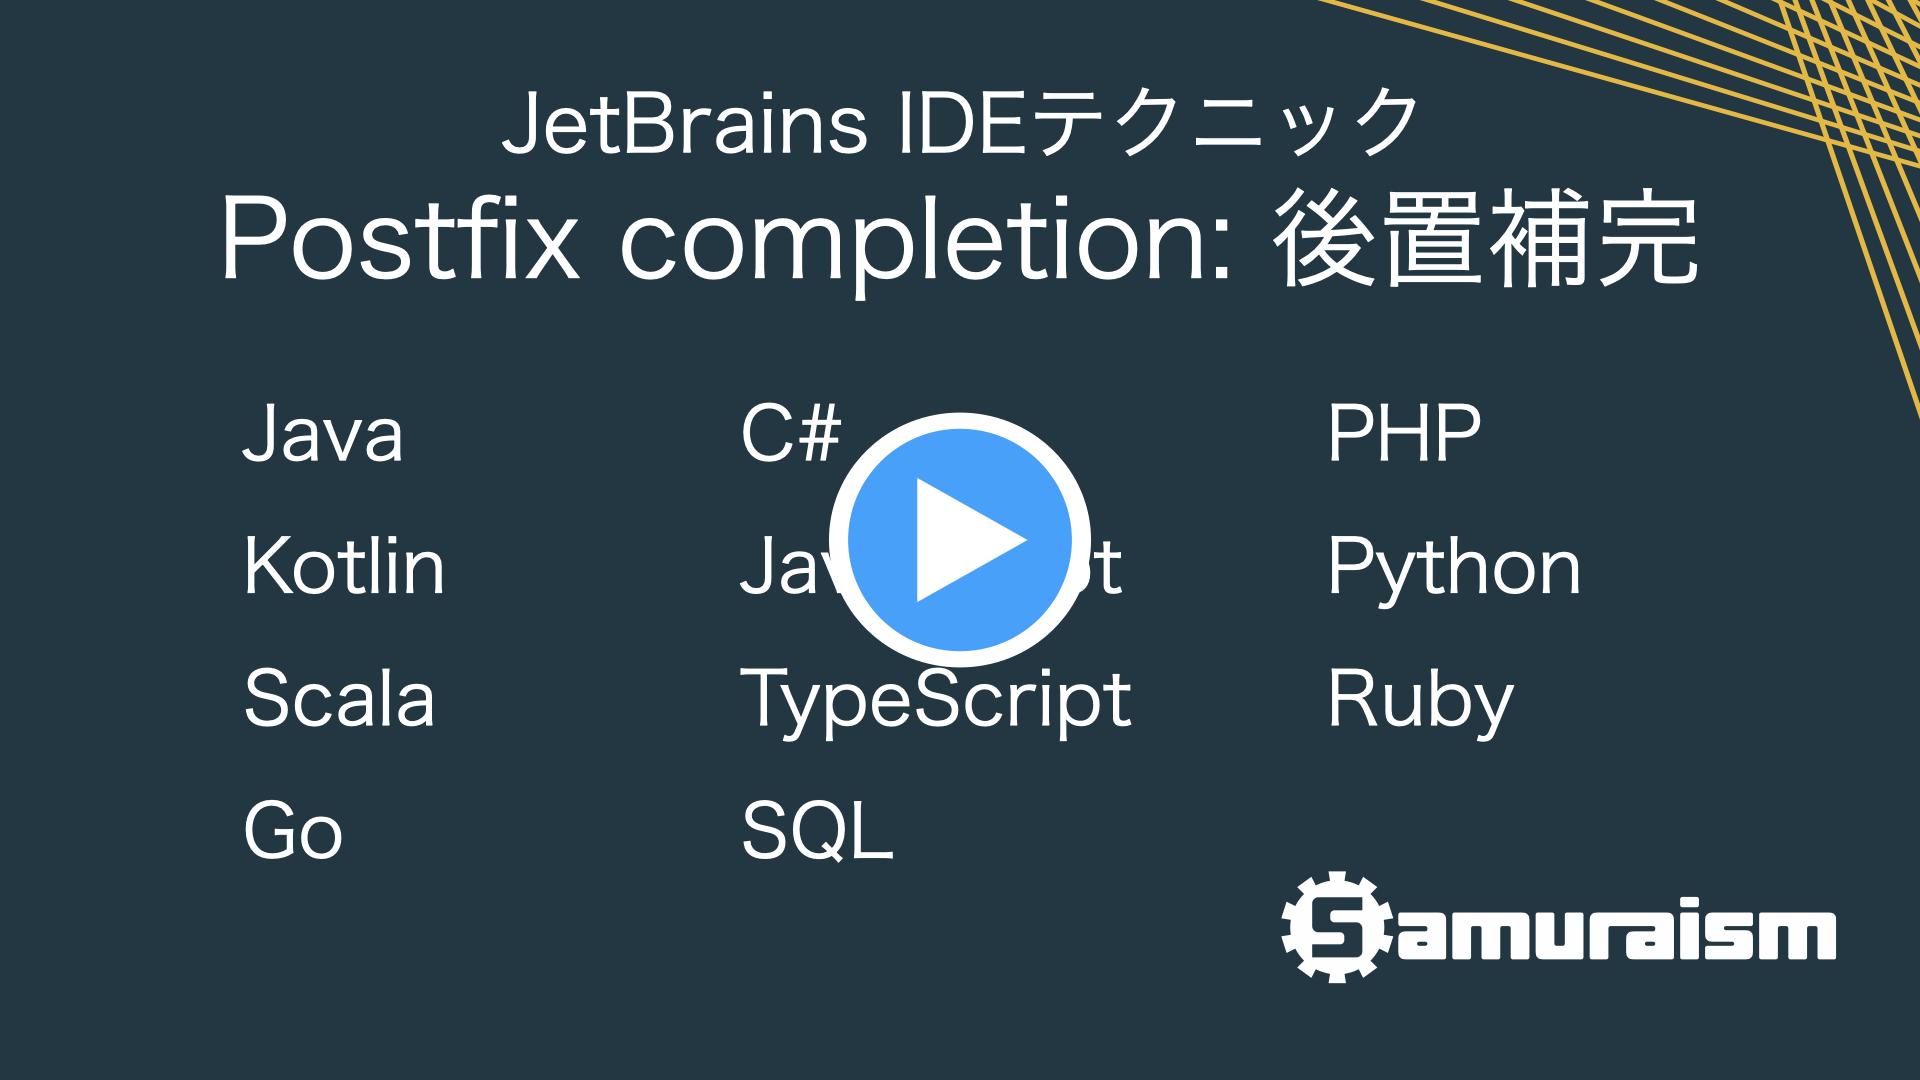 #JetBrainsIDEテクニック – Postfix completion: 後置補完